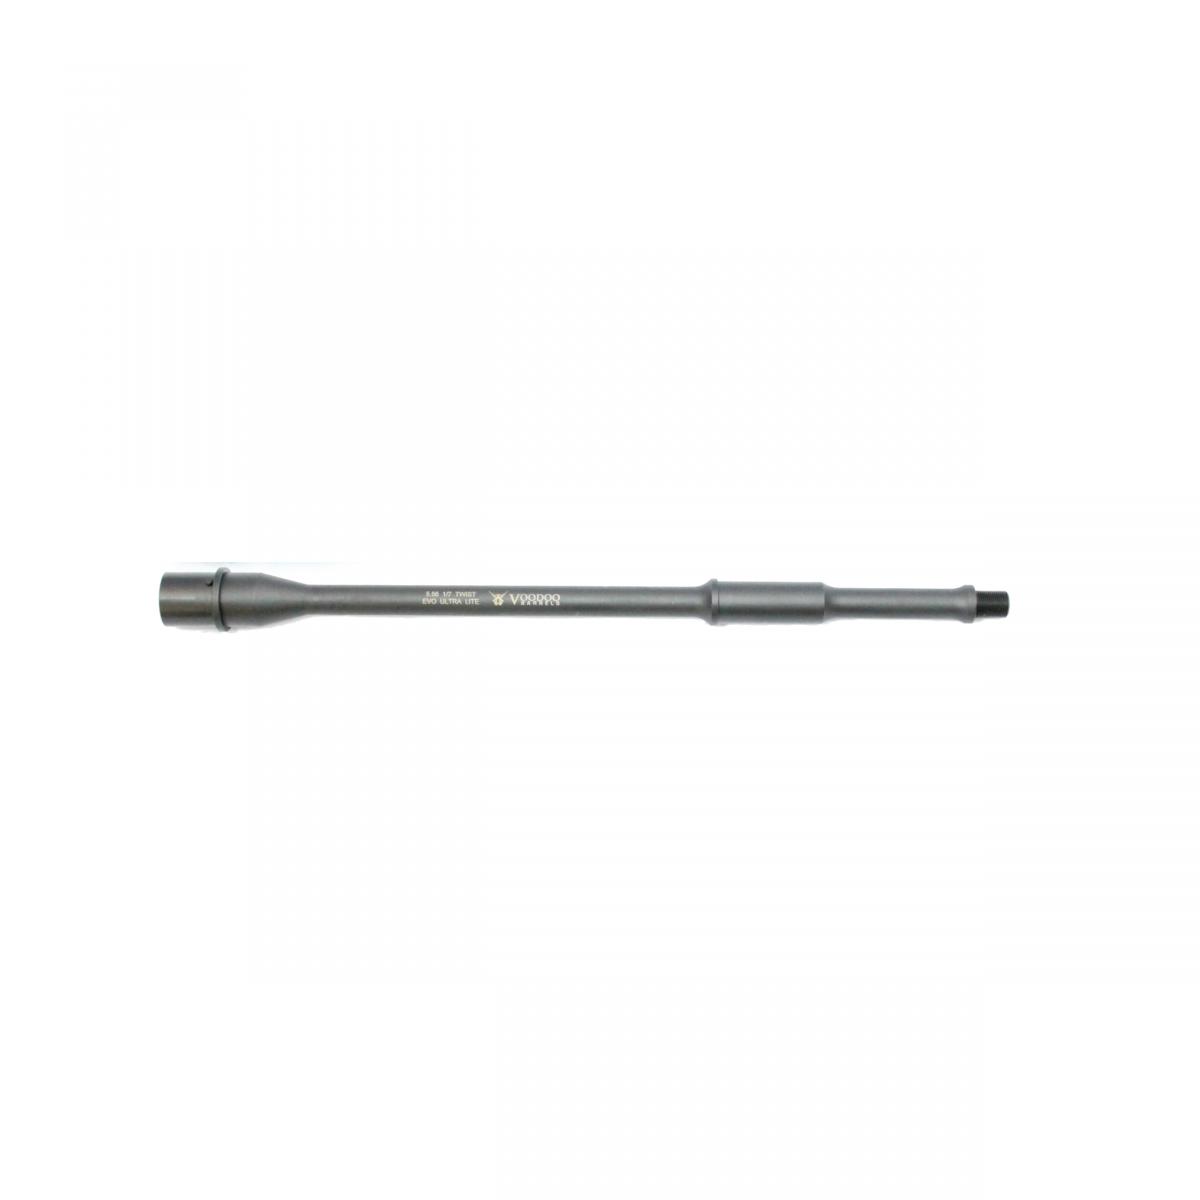 "14.5"" Mid Length Evo Ultra Lite .750"" C.O.R. VooDoo Barrel w/ Pinned VDI Manimal Flash Hider"